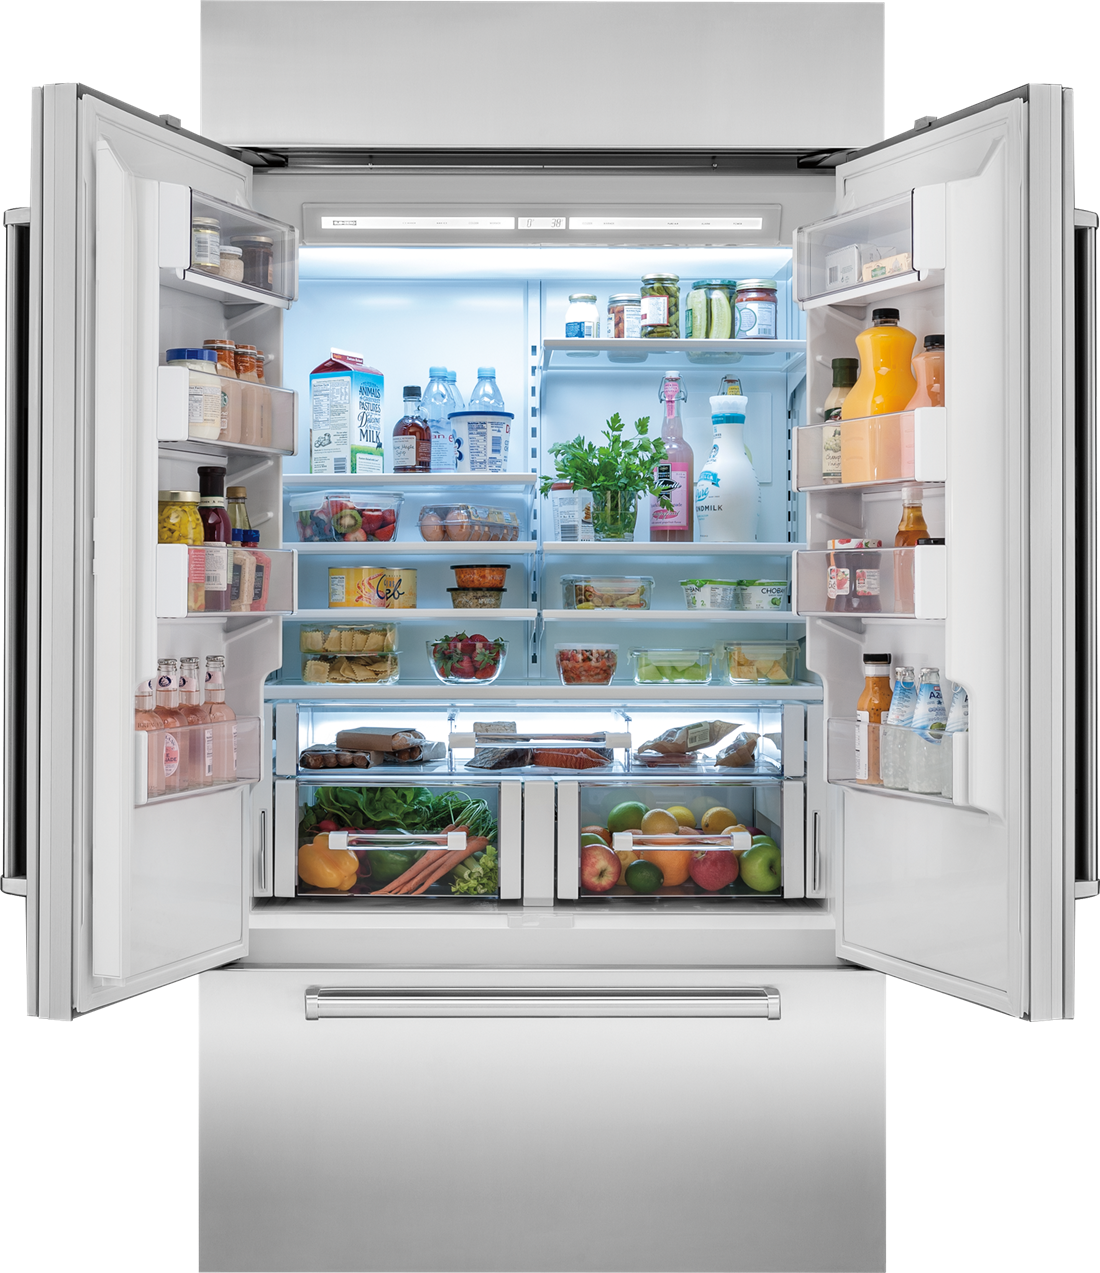 "Sub Zero Glass Door Refrigerator 42"" classic french door refrigerator/freezer - panel ready"